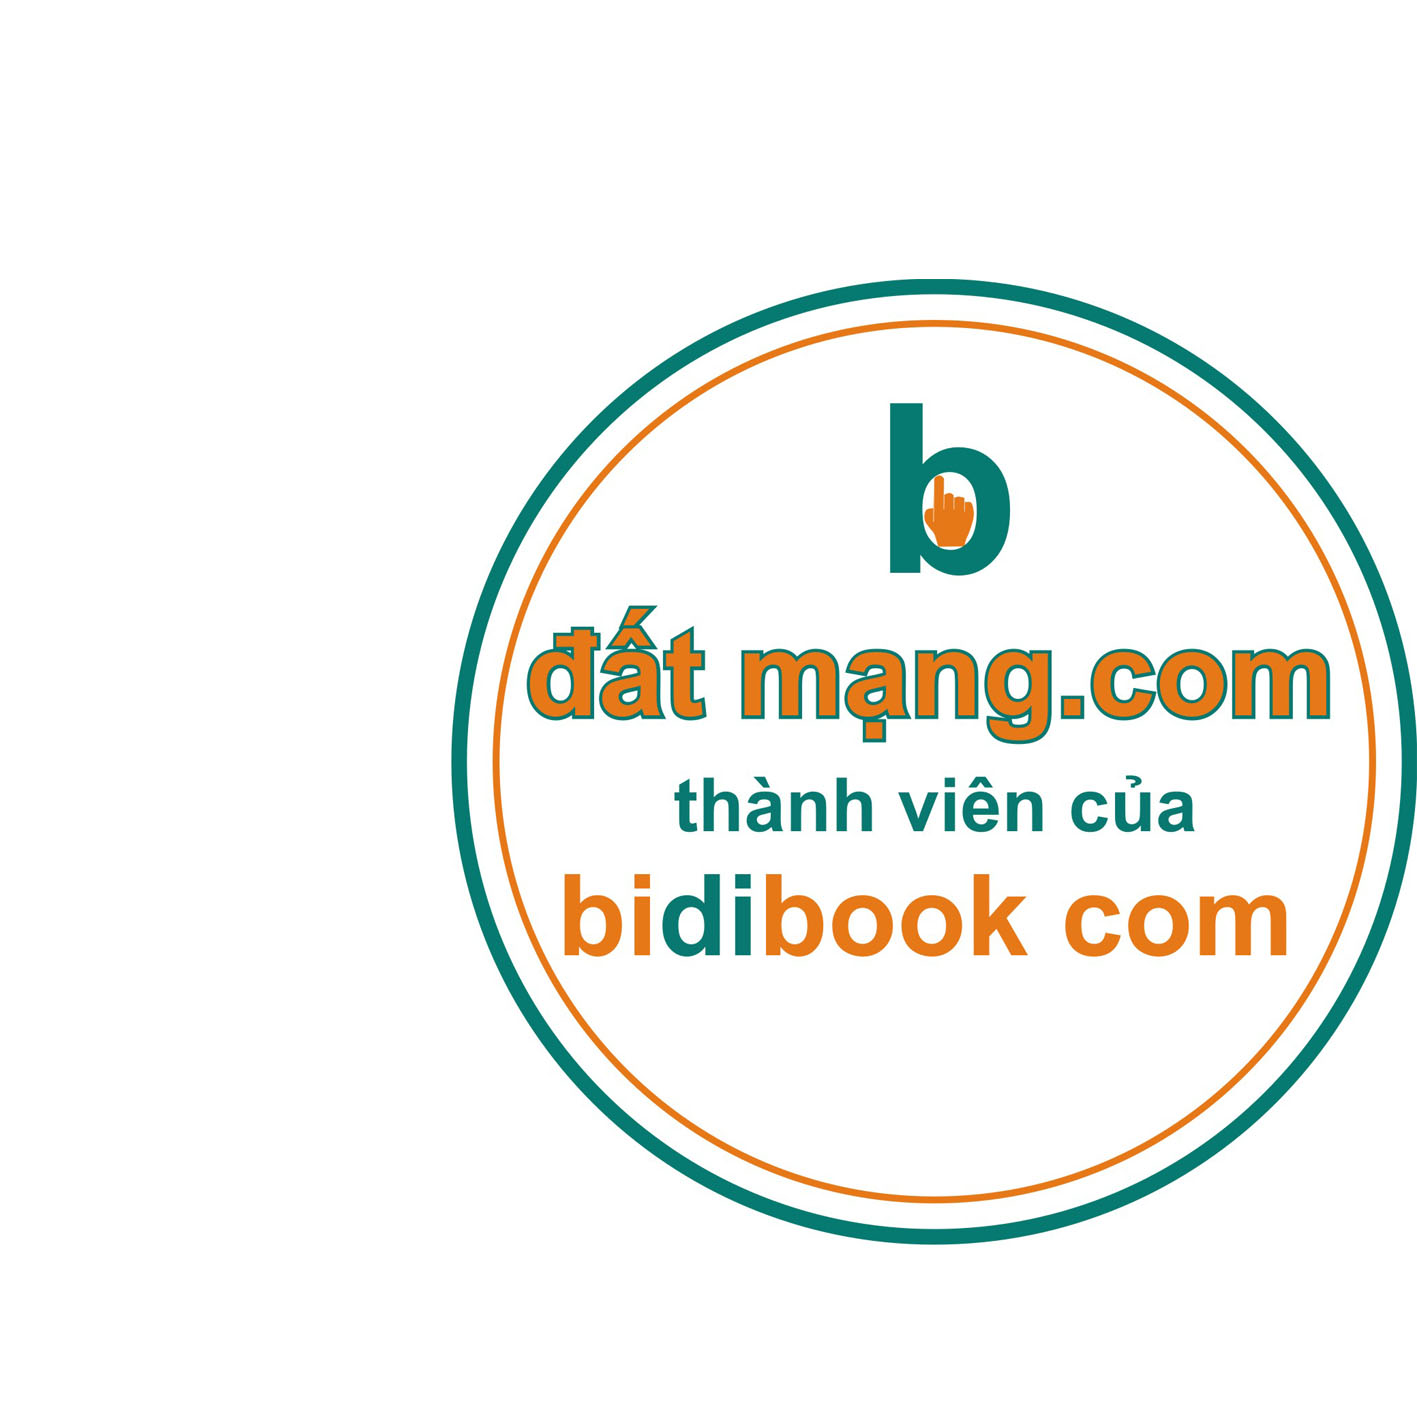 dat-mang-thanh-vien-bidibook